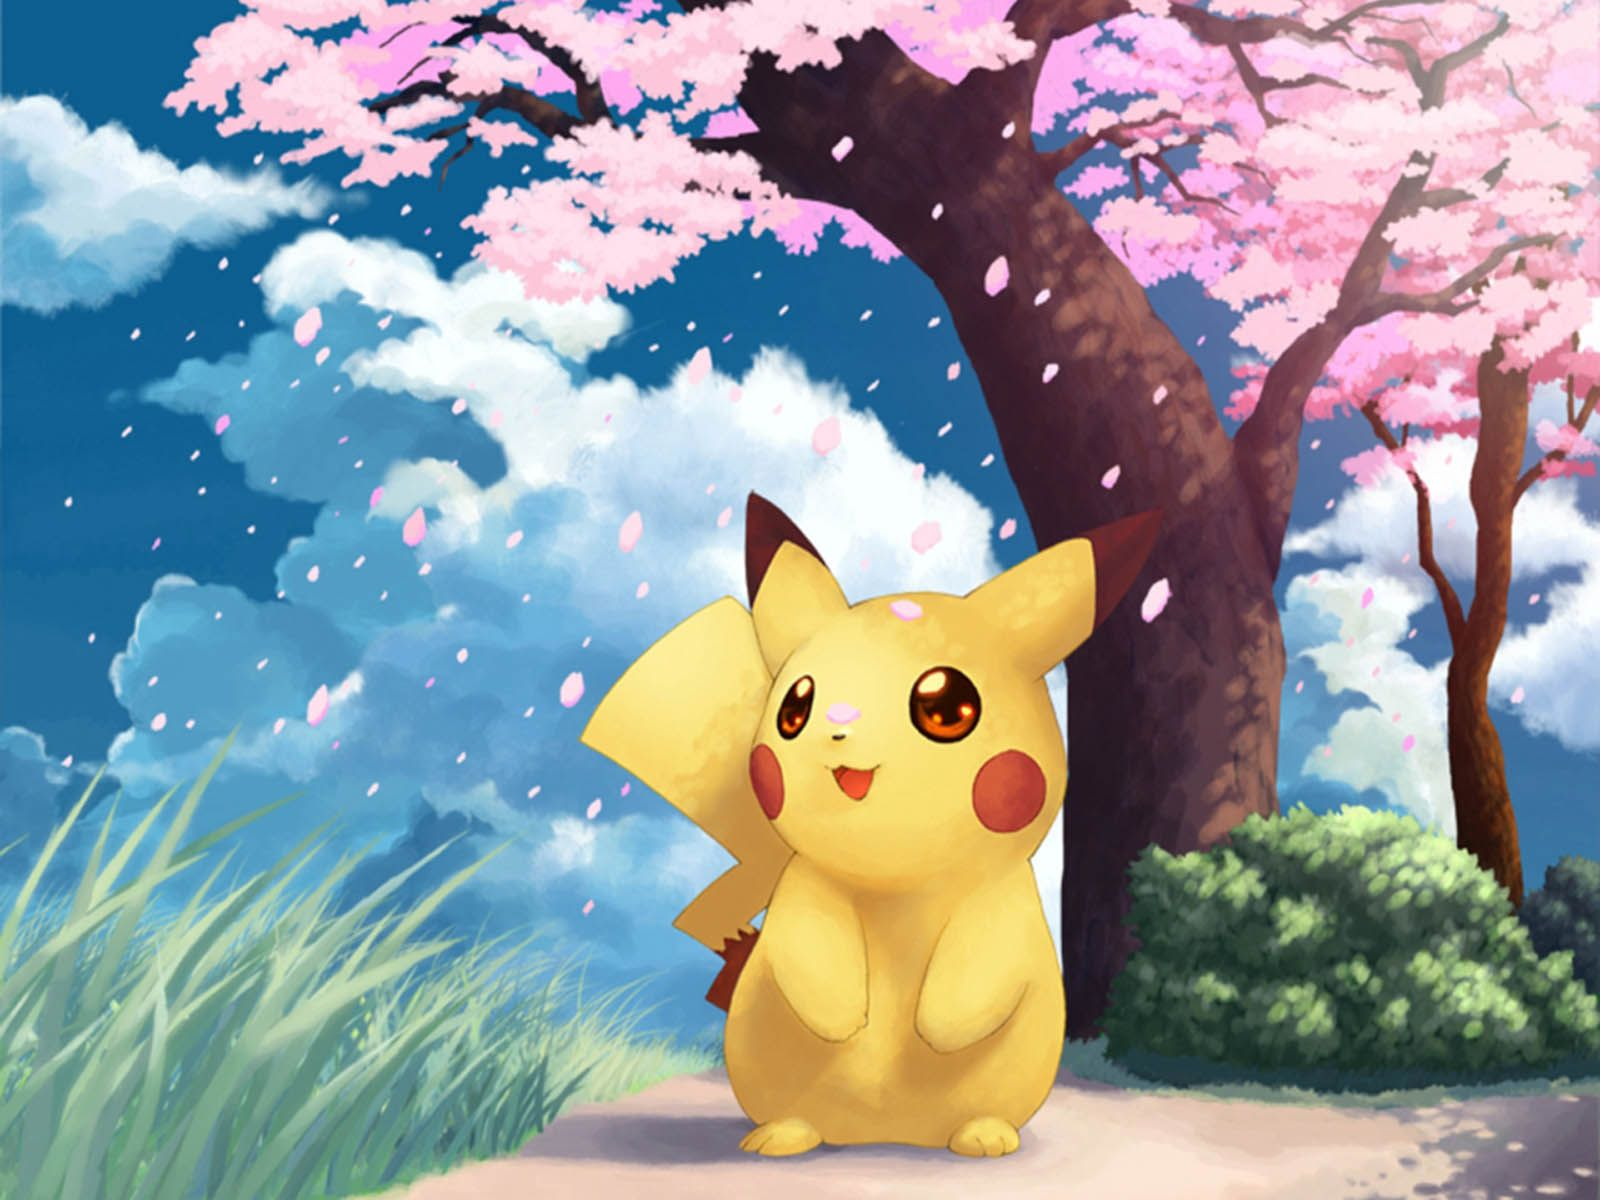 Pikachu 3D Wallpapers Top Free Pikachu 3D Backgrounds